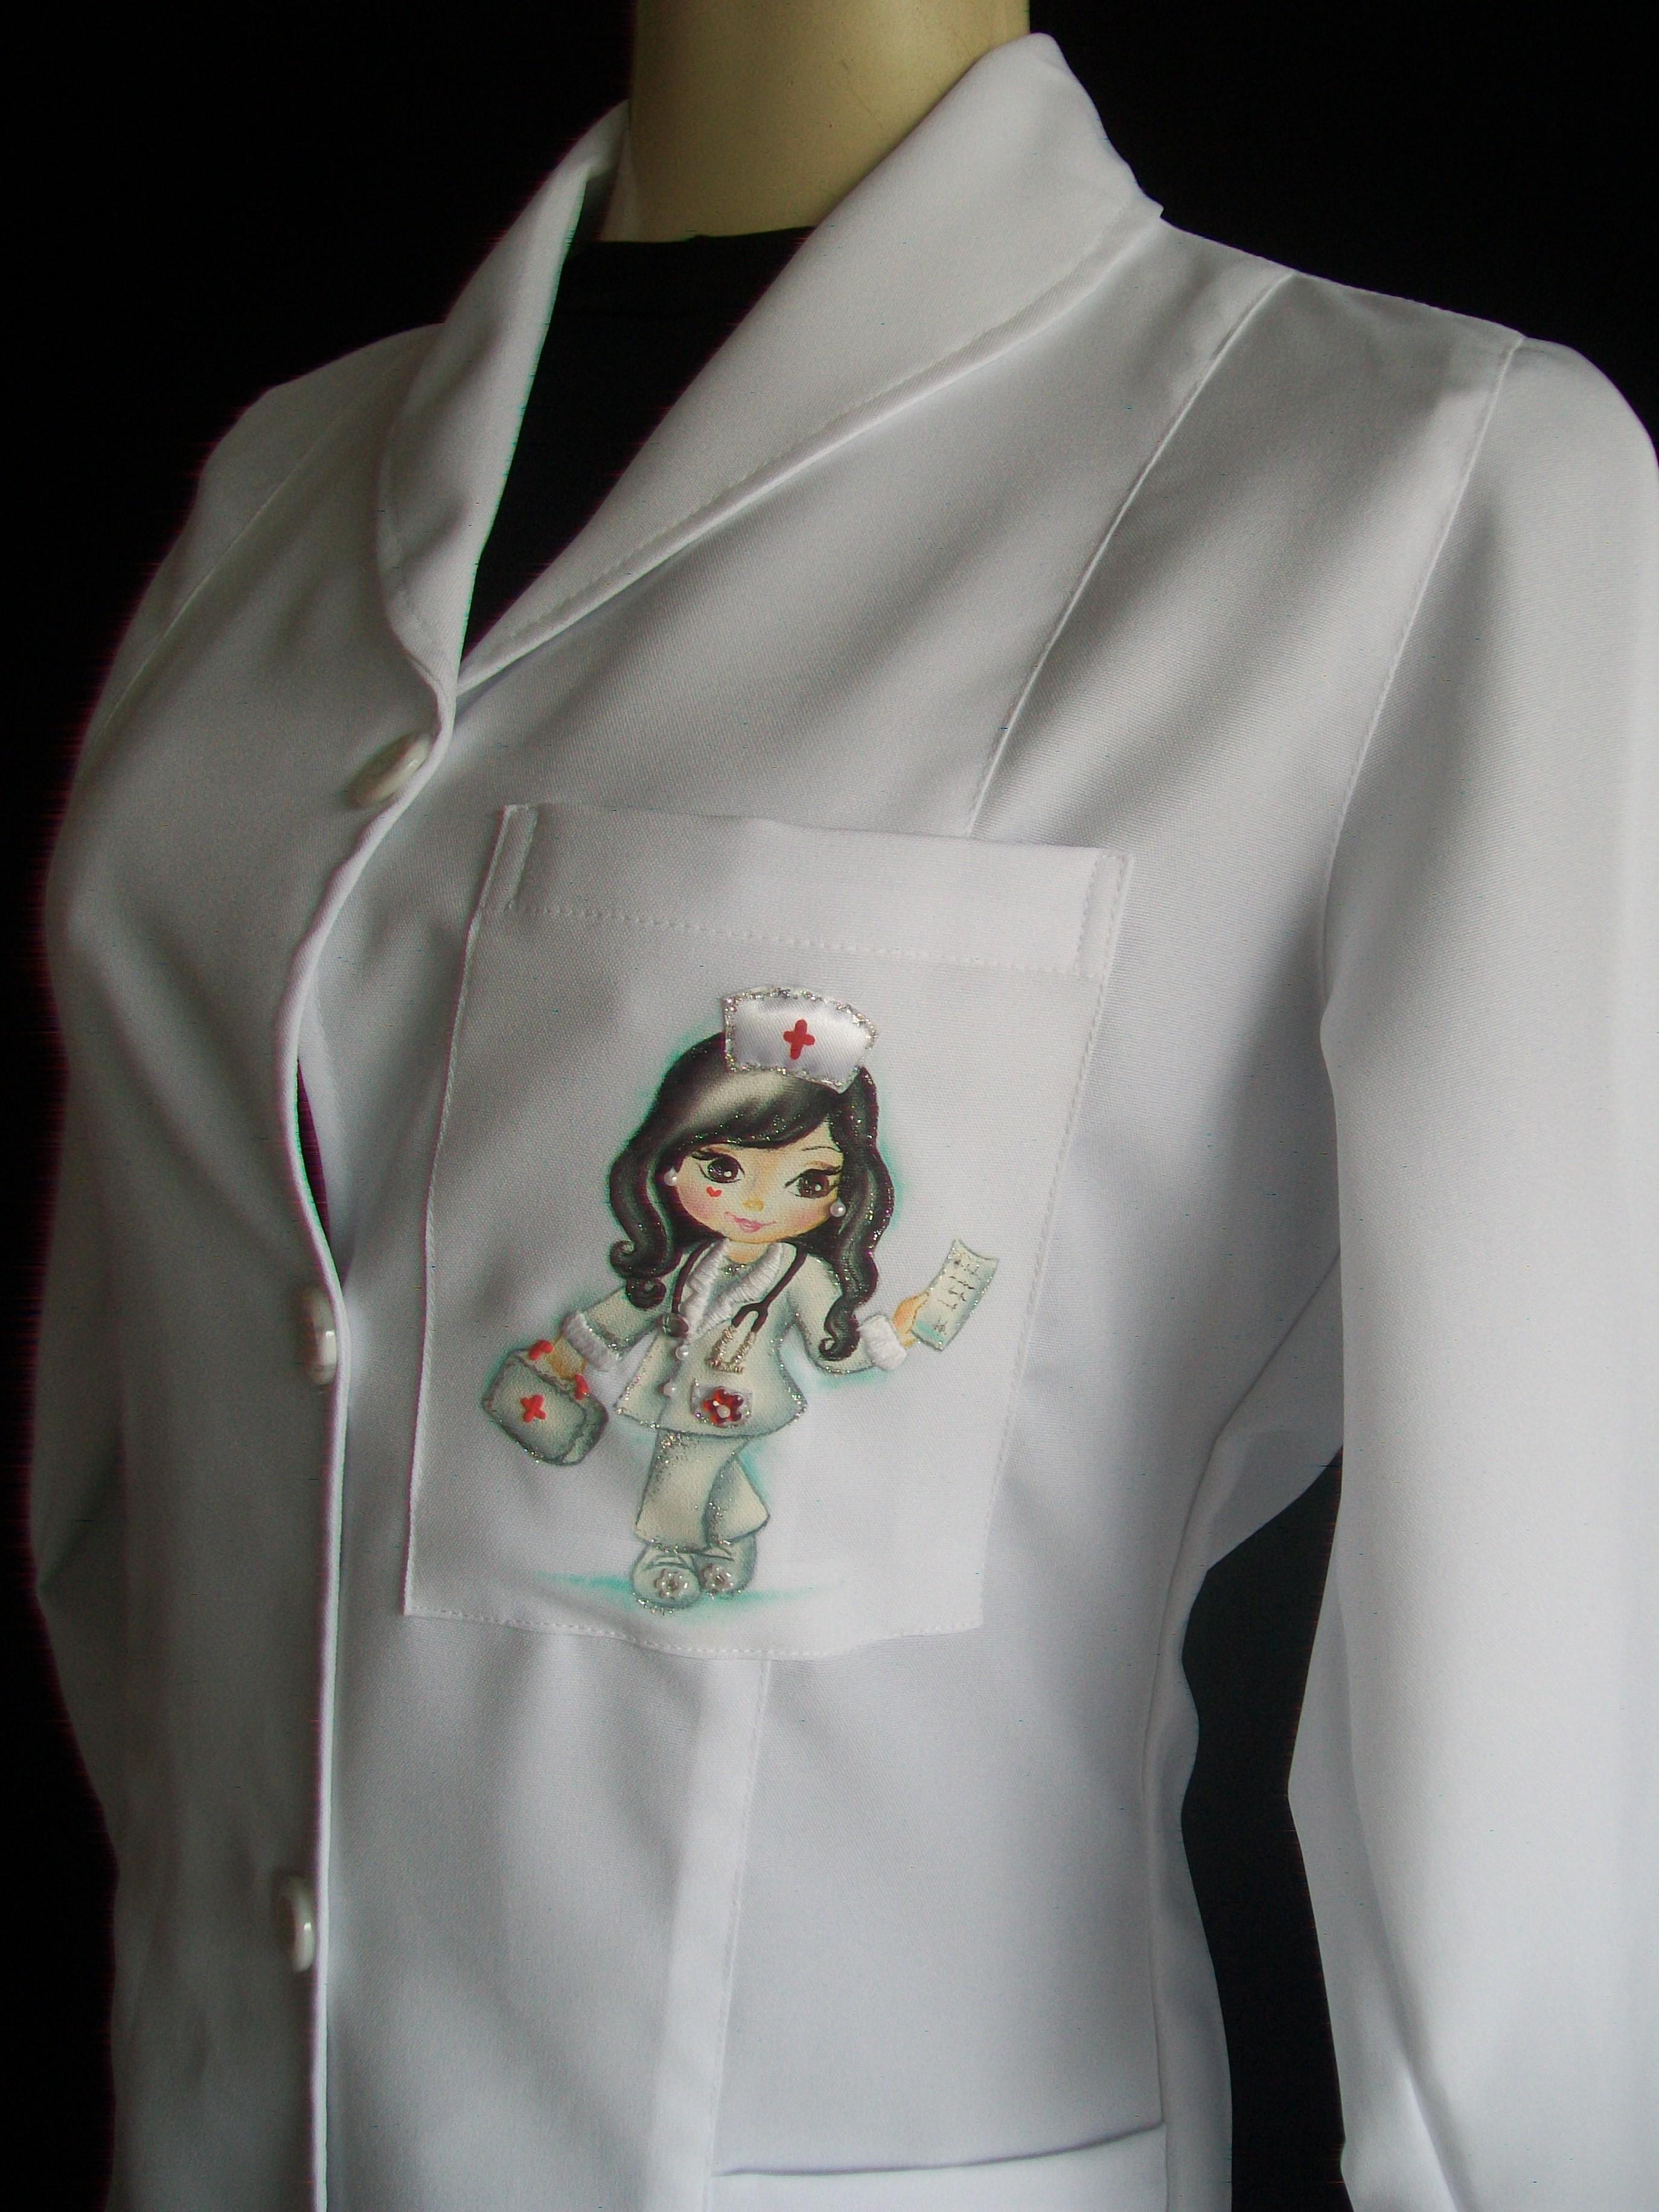 Jaleco Enfermagem Personalizado Bazar M 227 Os De Anjo Elo7